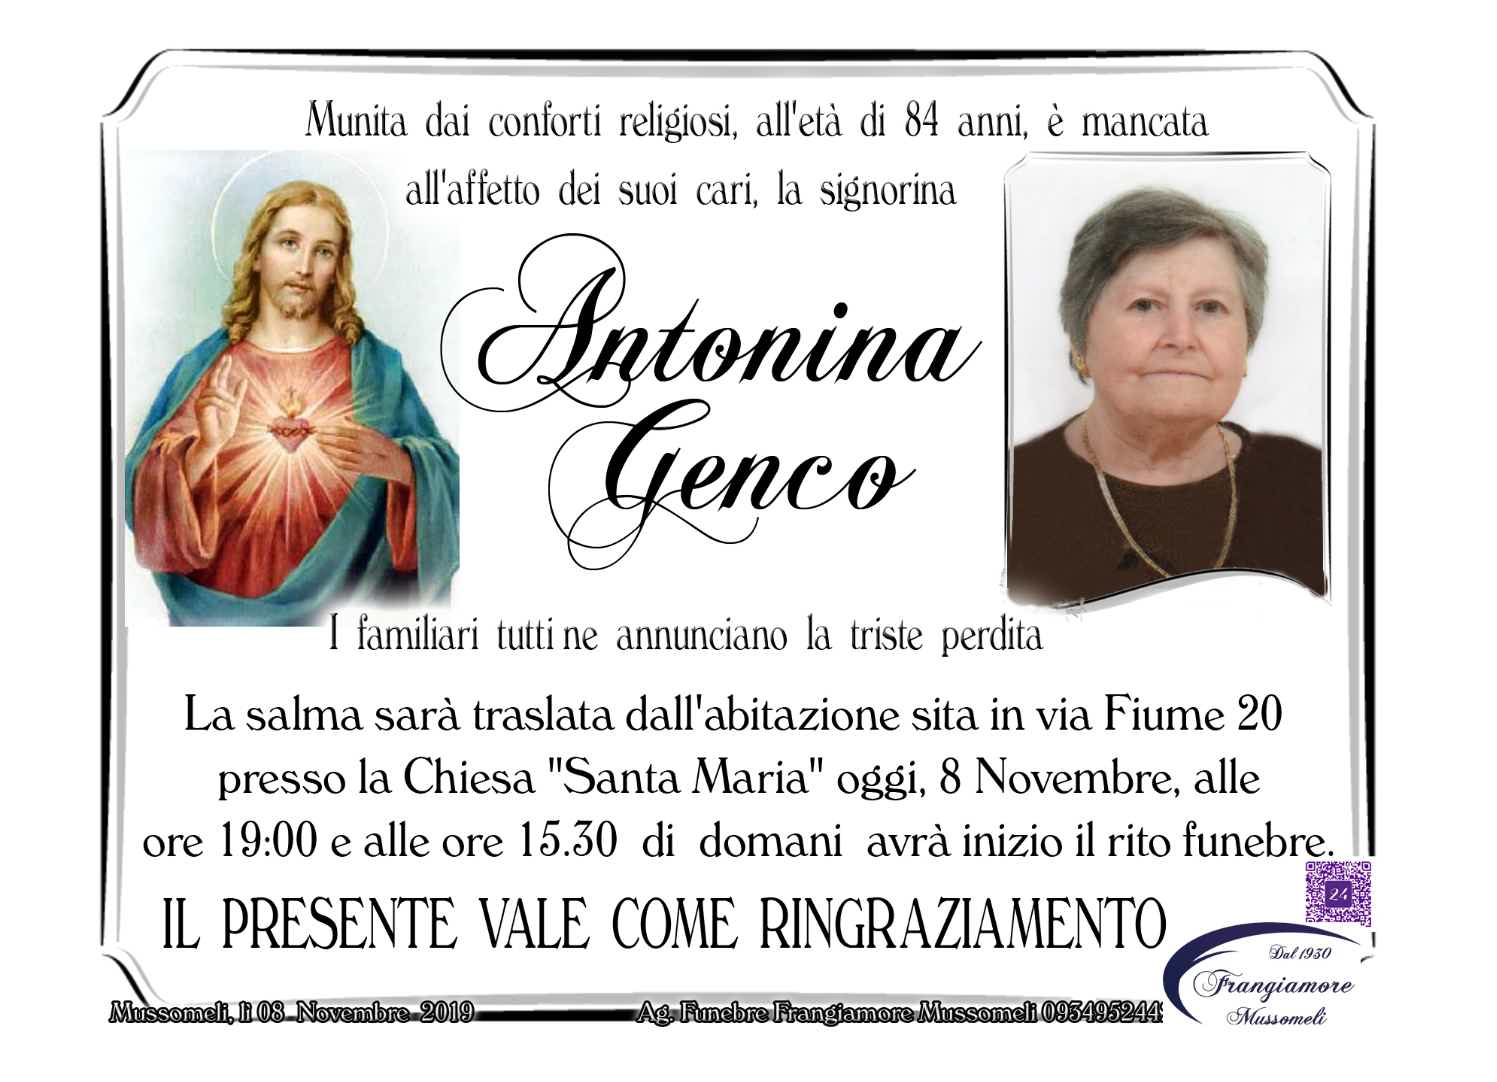 Antonina Genco